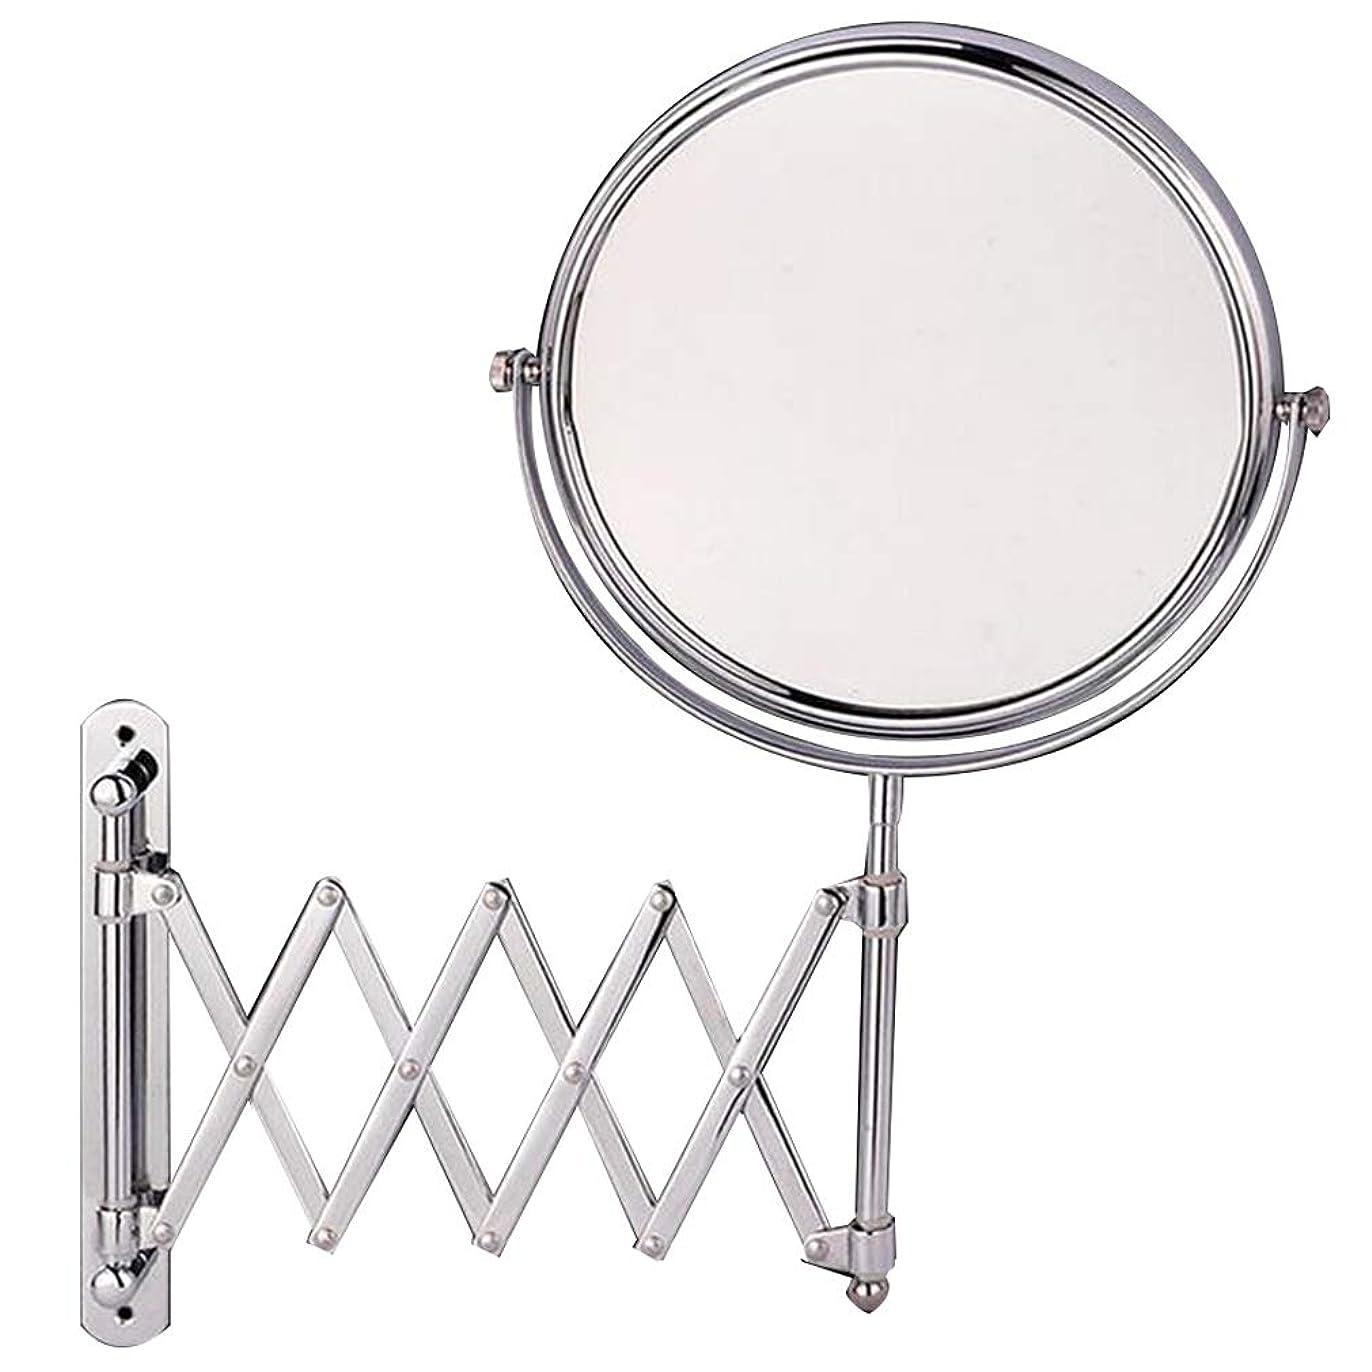 CUUYQ 壁掛け式 化粧鏡、両面 3倍拡大 けメイクミラー 360 °回転 伸縮可能折り 化粧ミラー 8インチステンレススチール,Silver